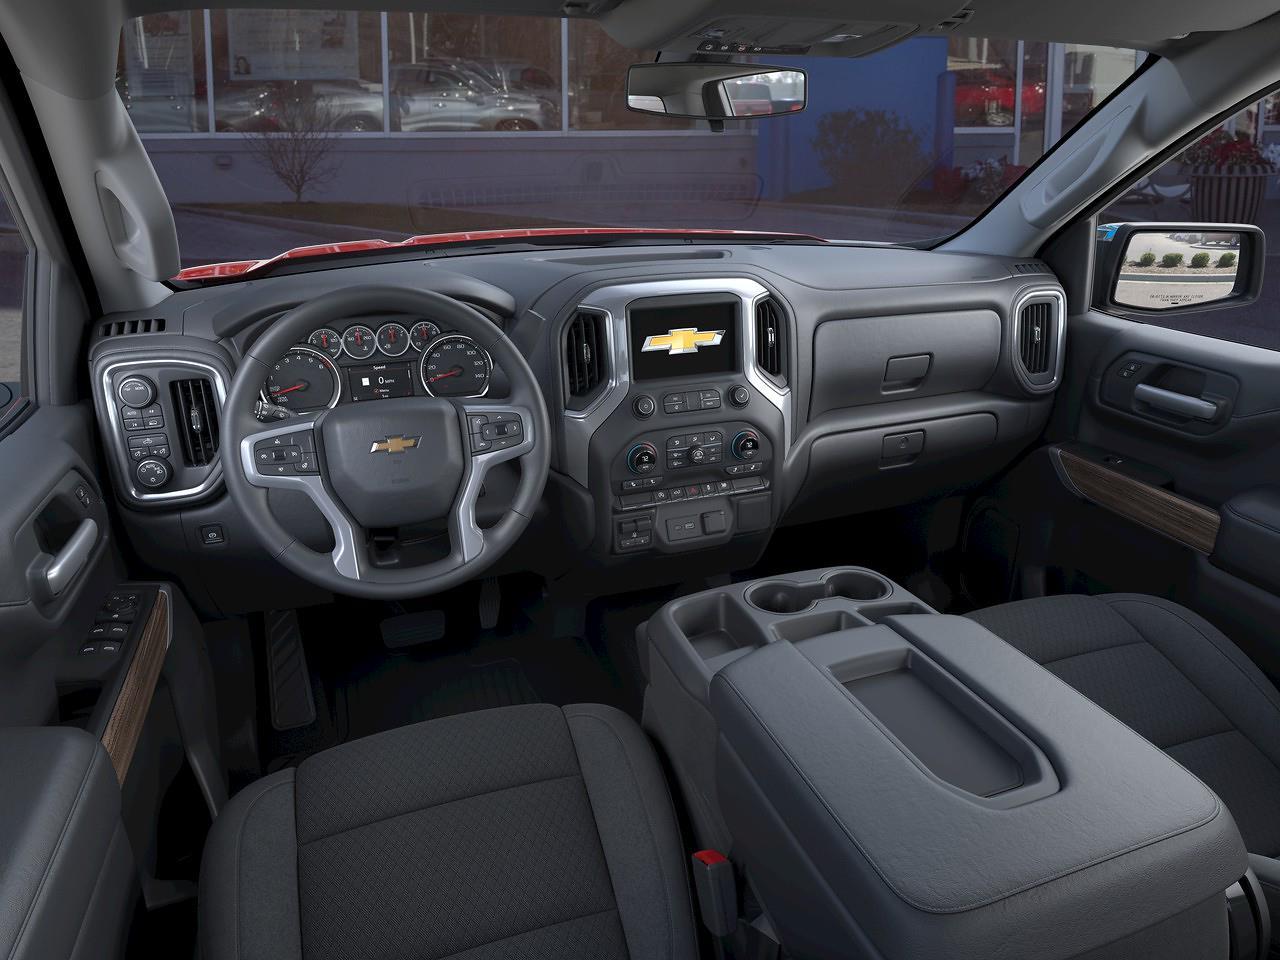 2021 Chevrolet Silverado 1500 Crew Cab 4x4, Pickup #CK1552 - photo 11